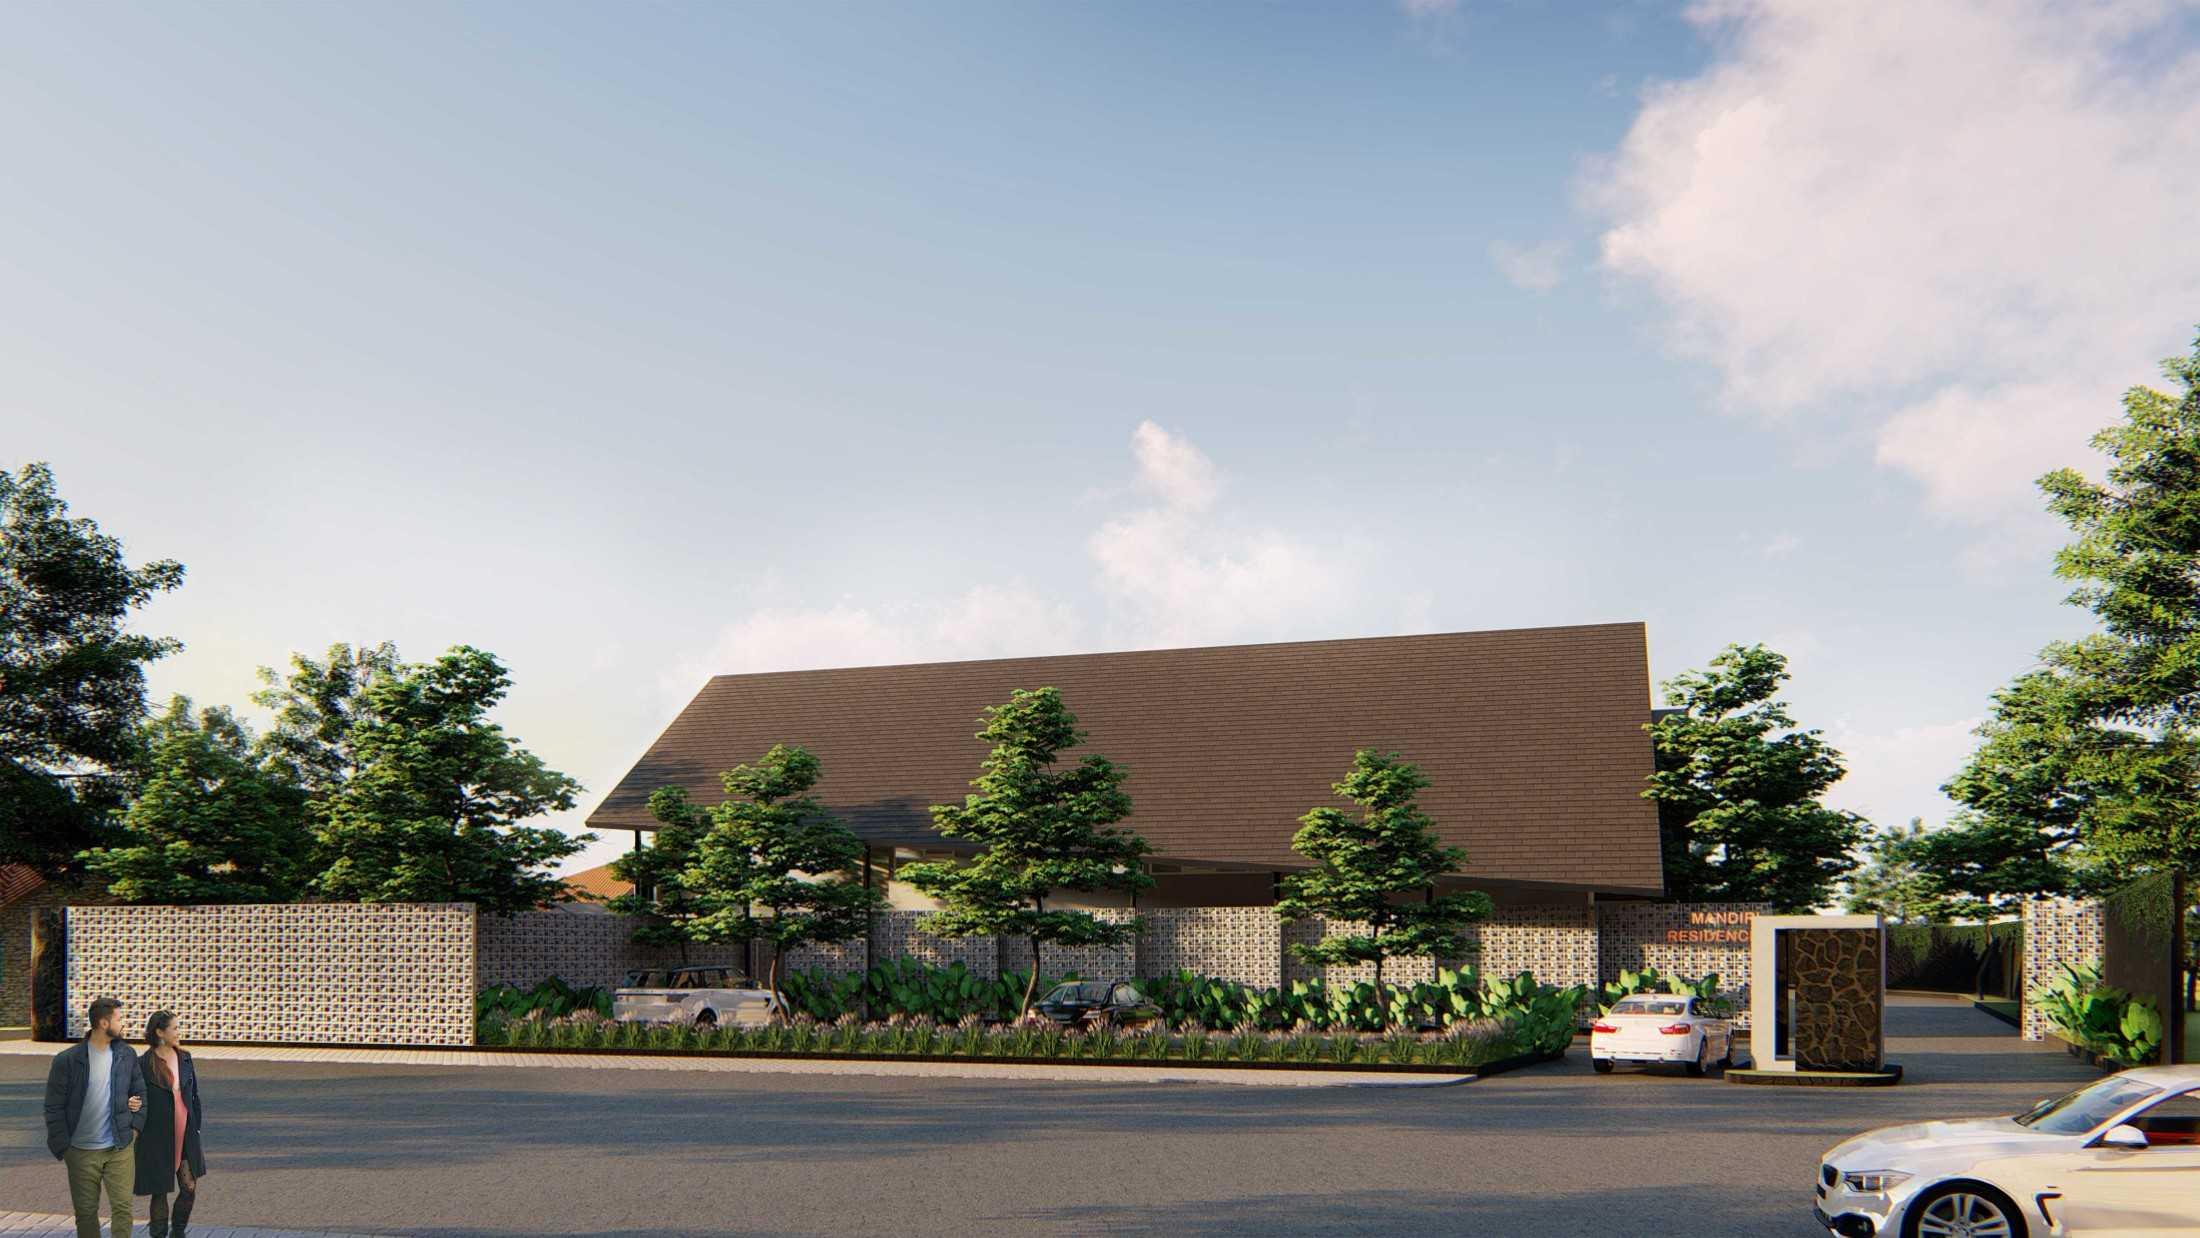 Pt. Modula Kawasan Hunian Wisma Mandiri & Warehouse Center Kabupaten Kudus, Jawa Tengah, Indonesia Kabupaten Kudus, Jawa Tengah, Indonesia Pt-Modula-Kawasan-Hunian-Wisma-Mandiri-Warehouse-Center  61389